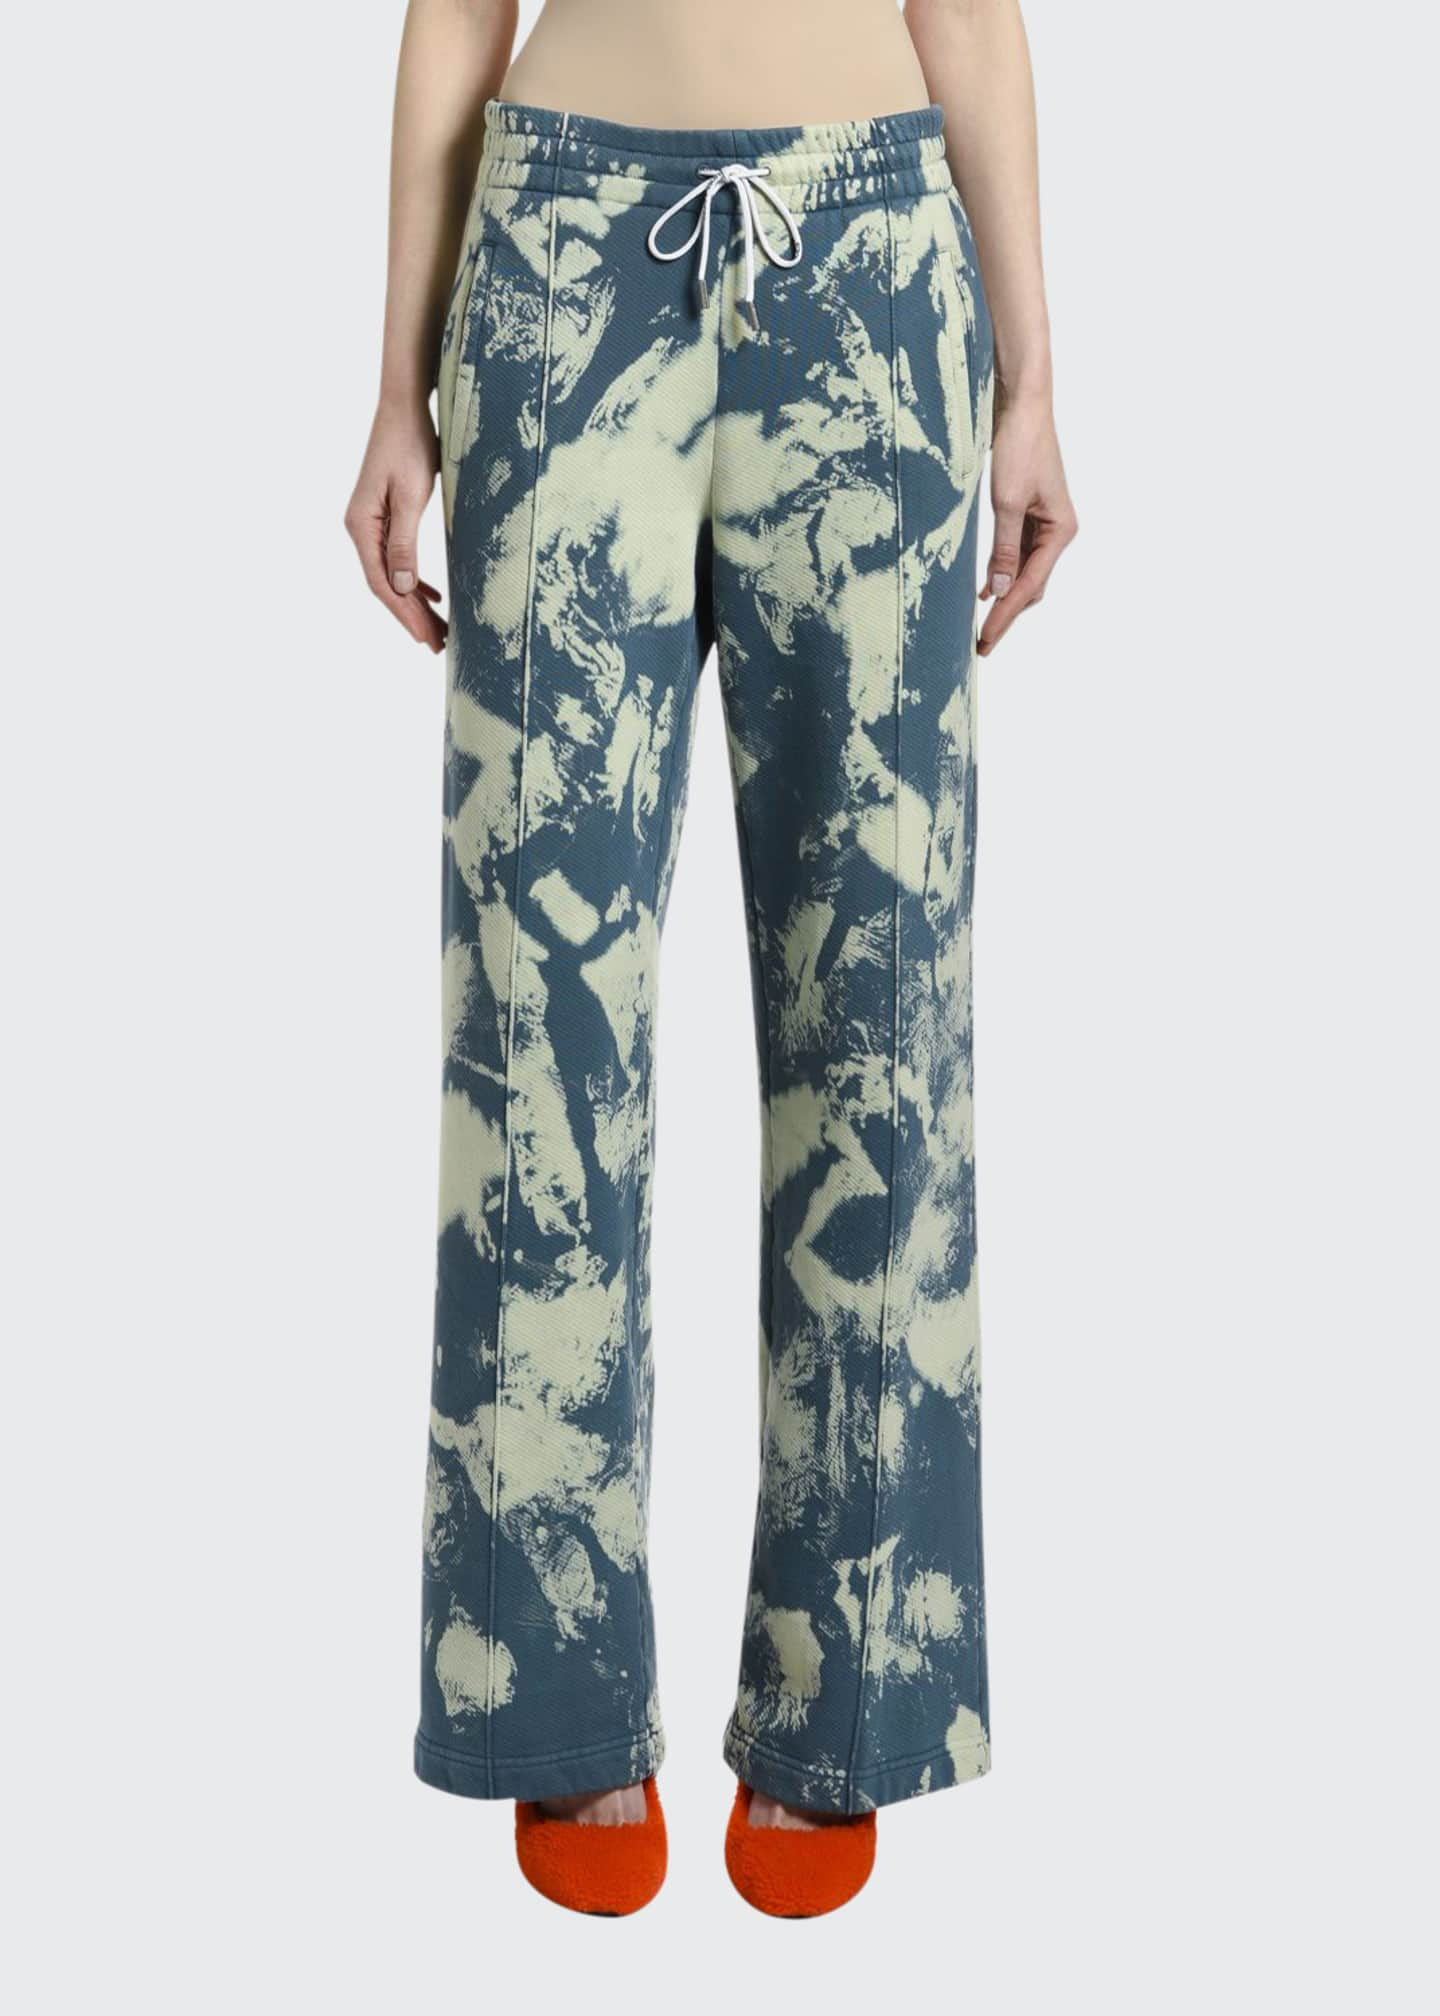 Off-White Tie-Dye Track Pants